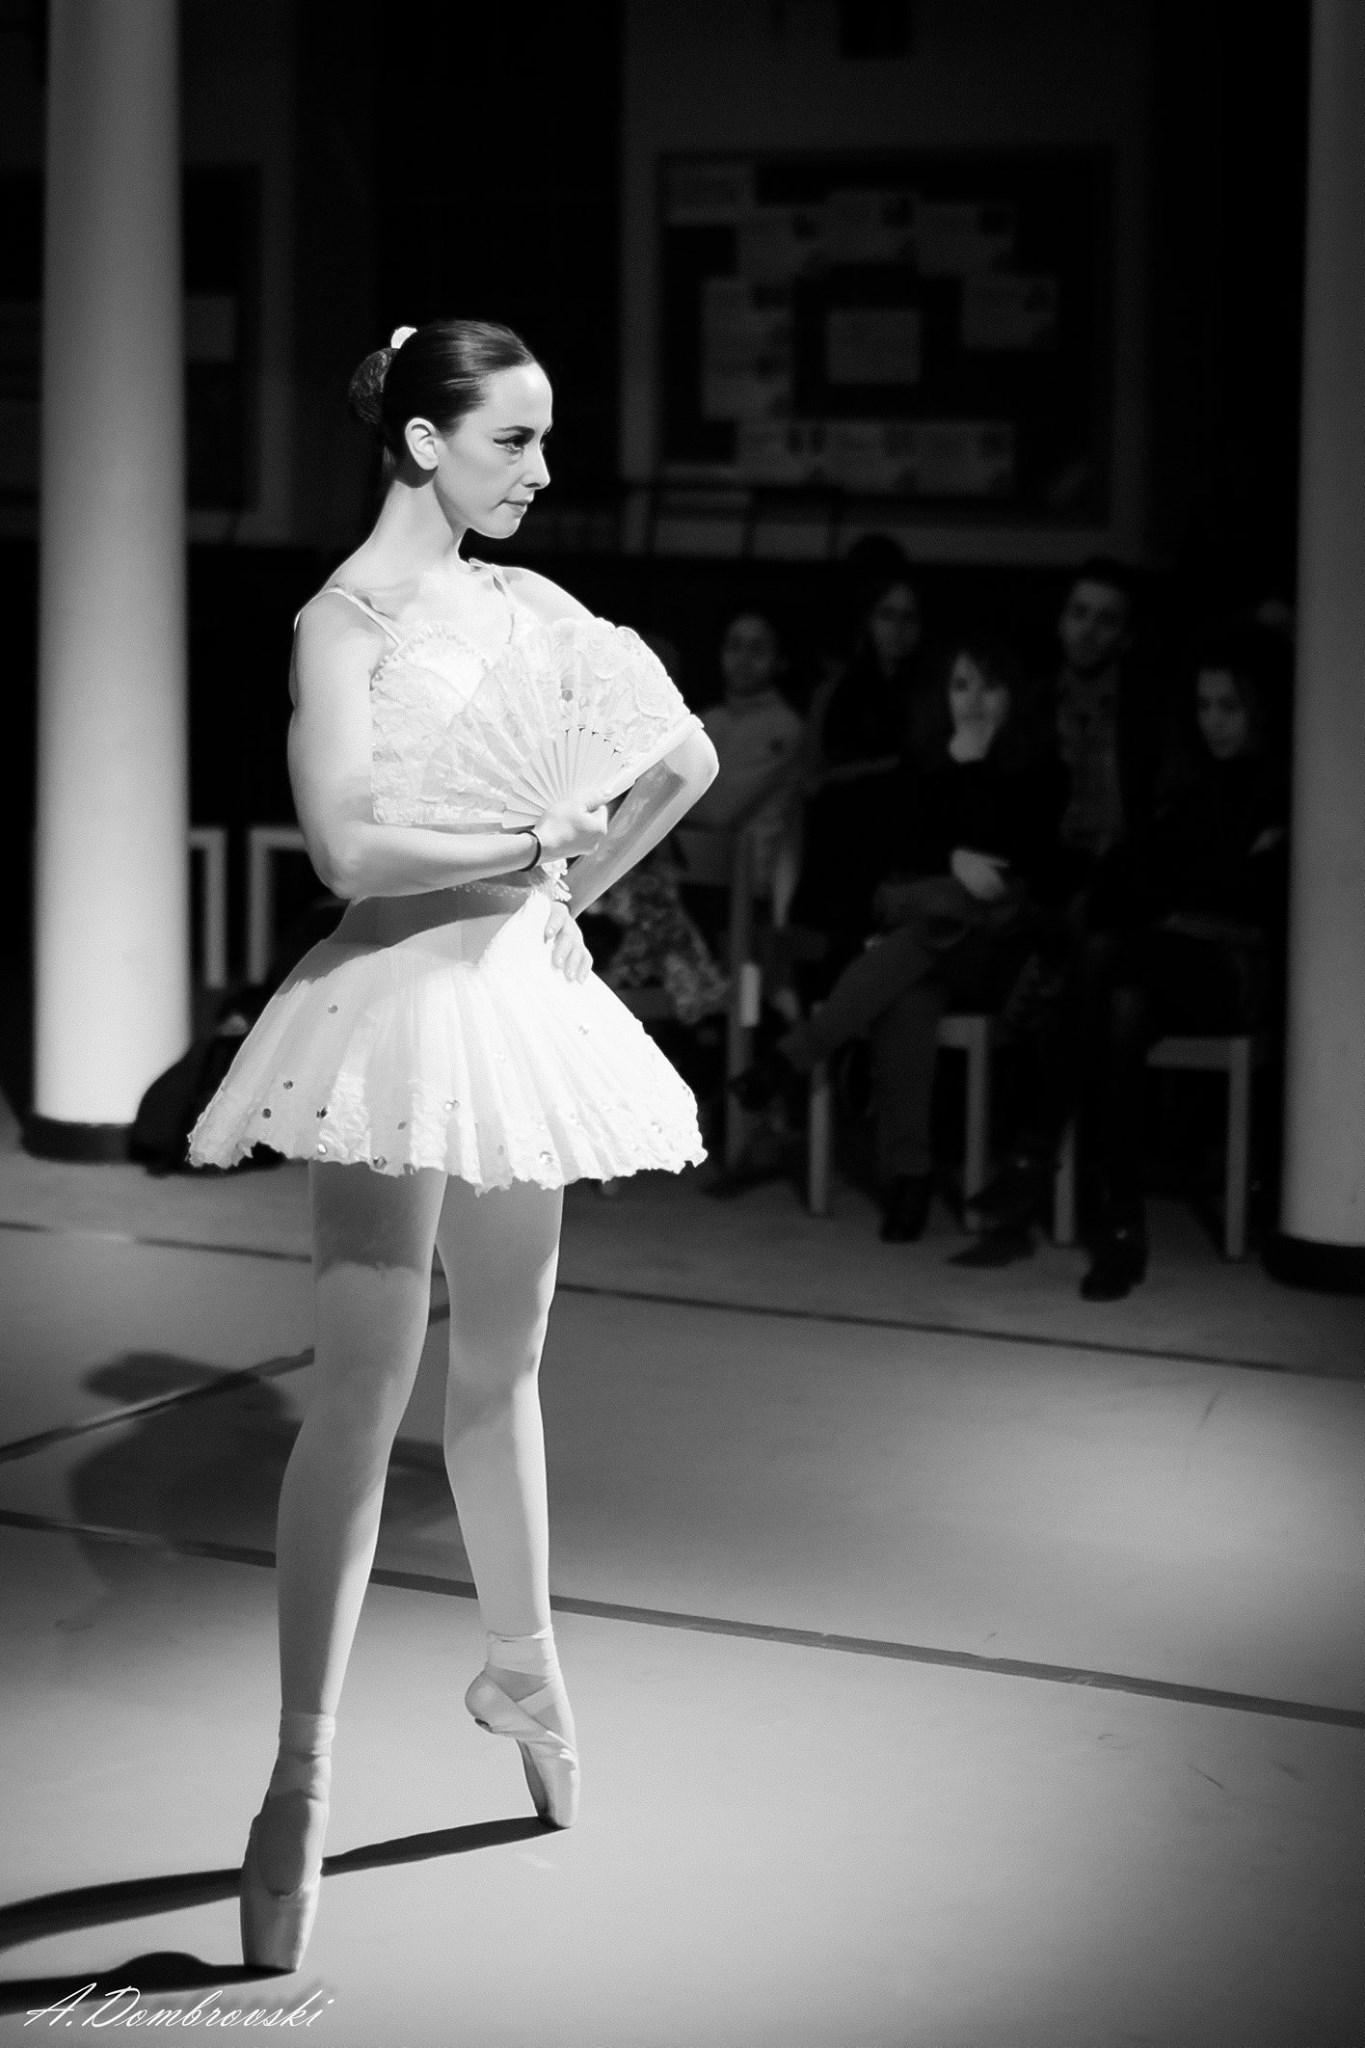 Don Quixote Ballet variation